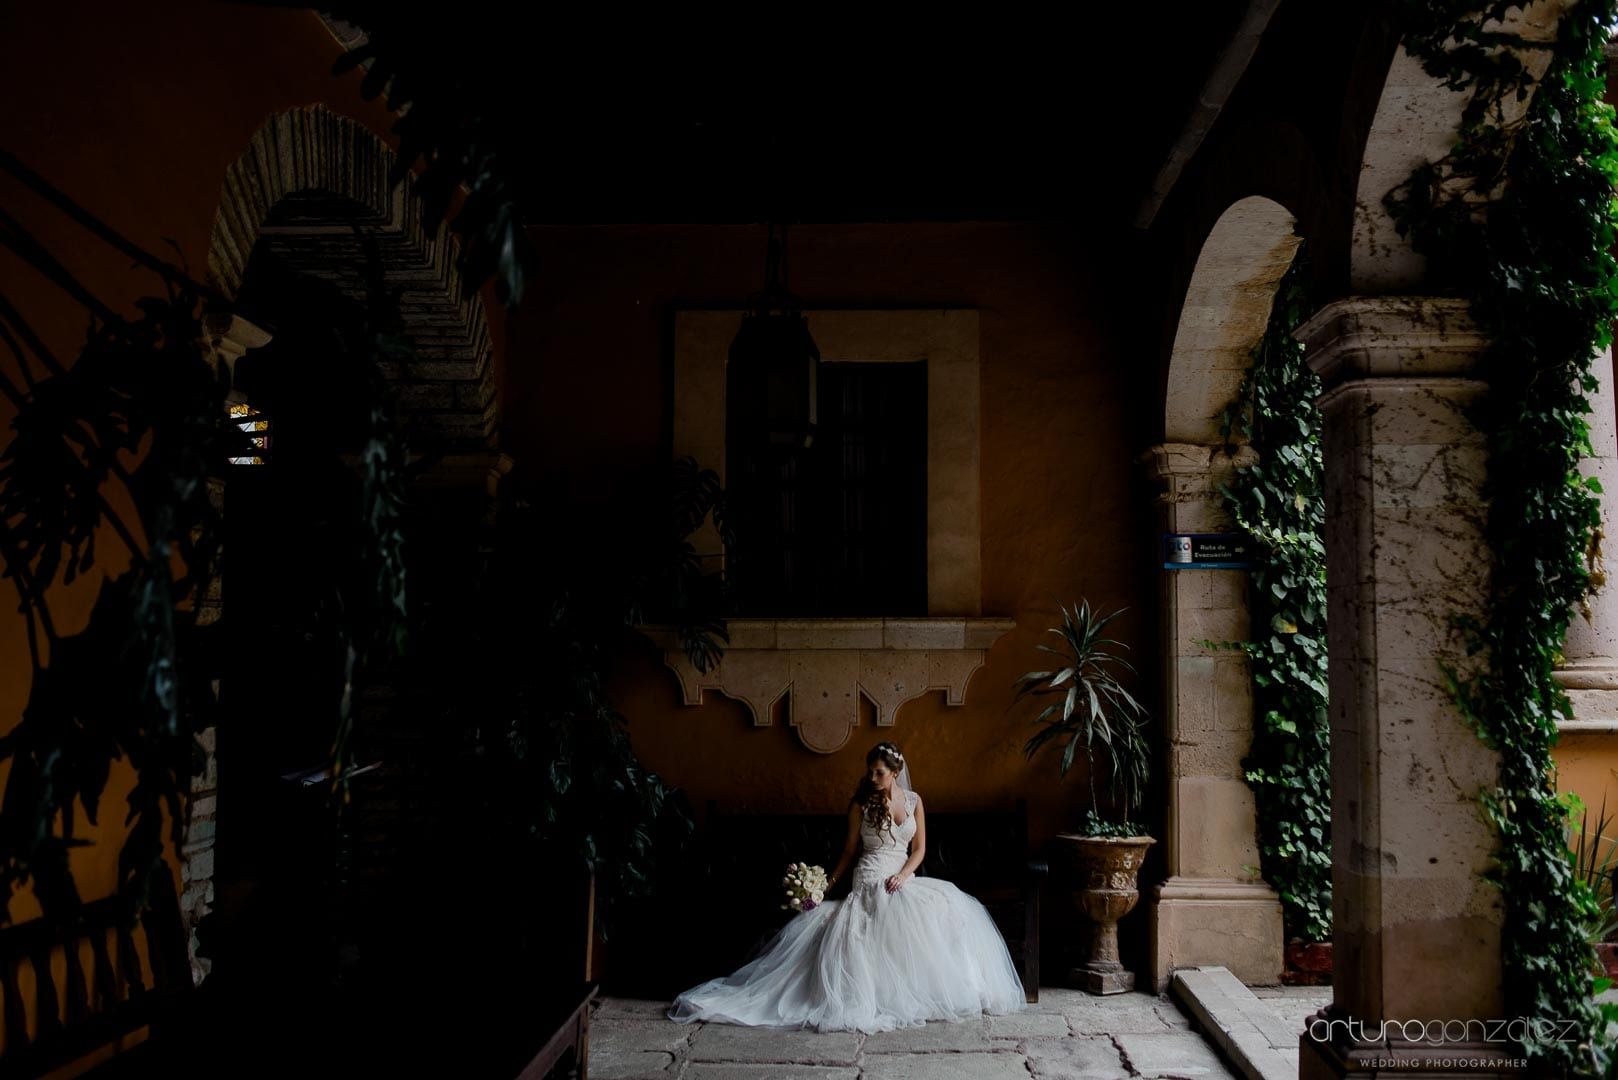 fotografo-de-bodas-en-guanajuato-30